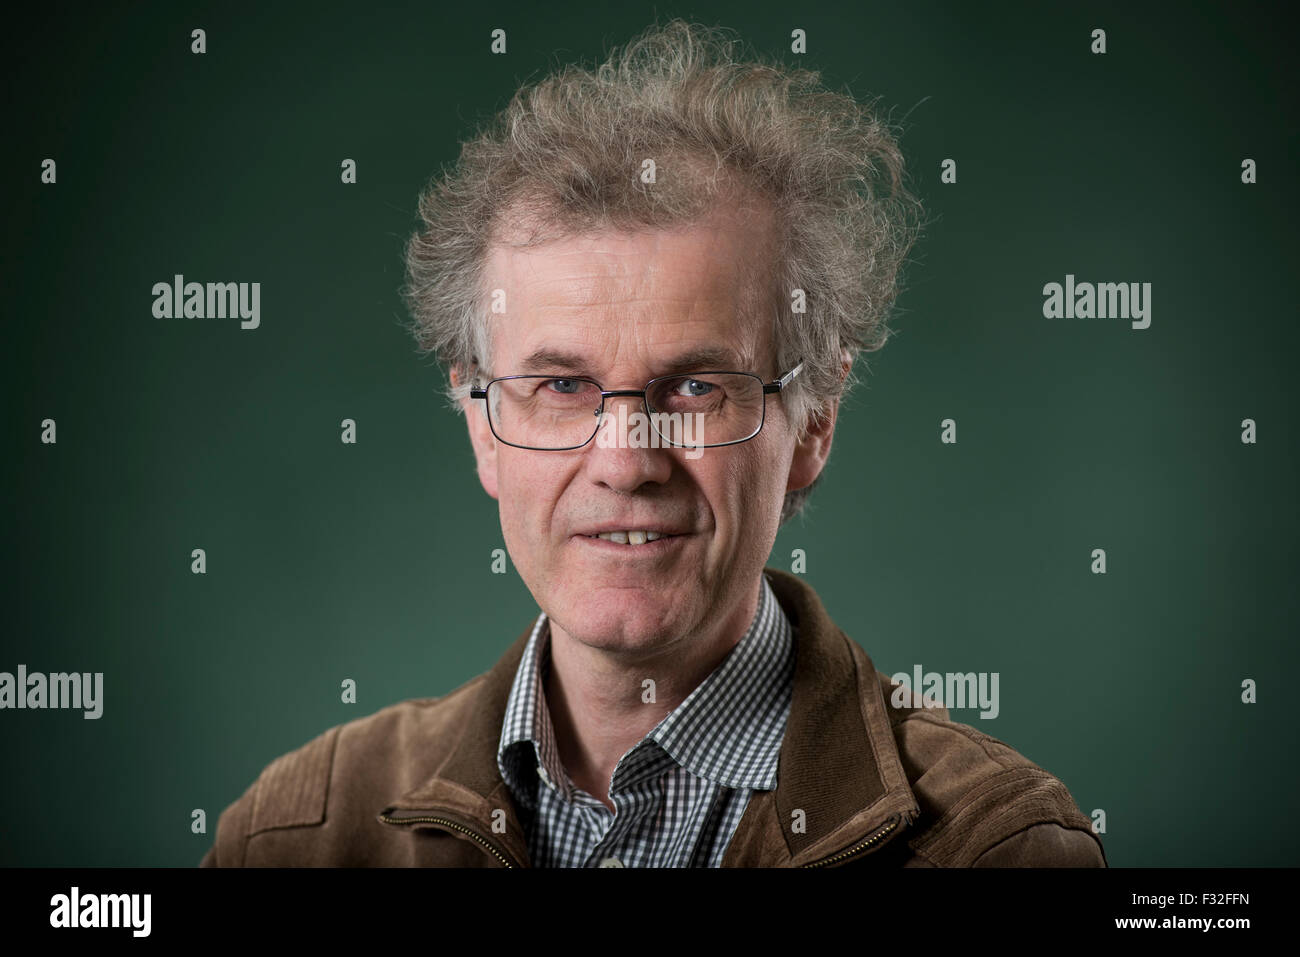 Scottish poet, scholar and critic Robert Crawford FRSE FBA. - Stock Image